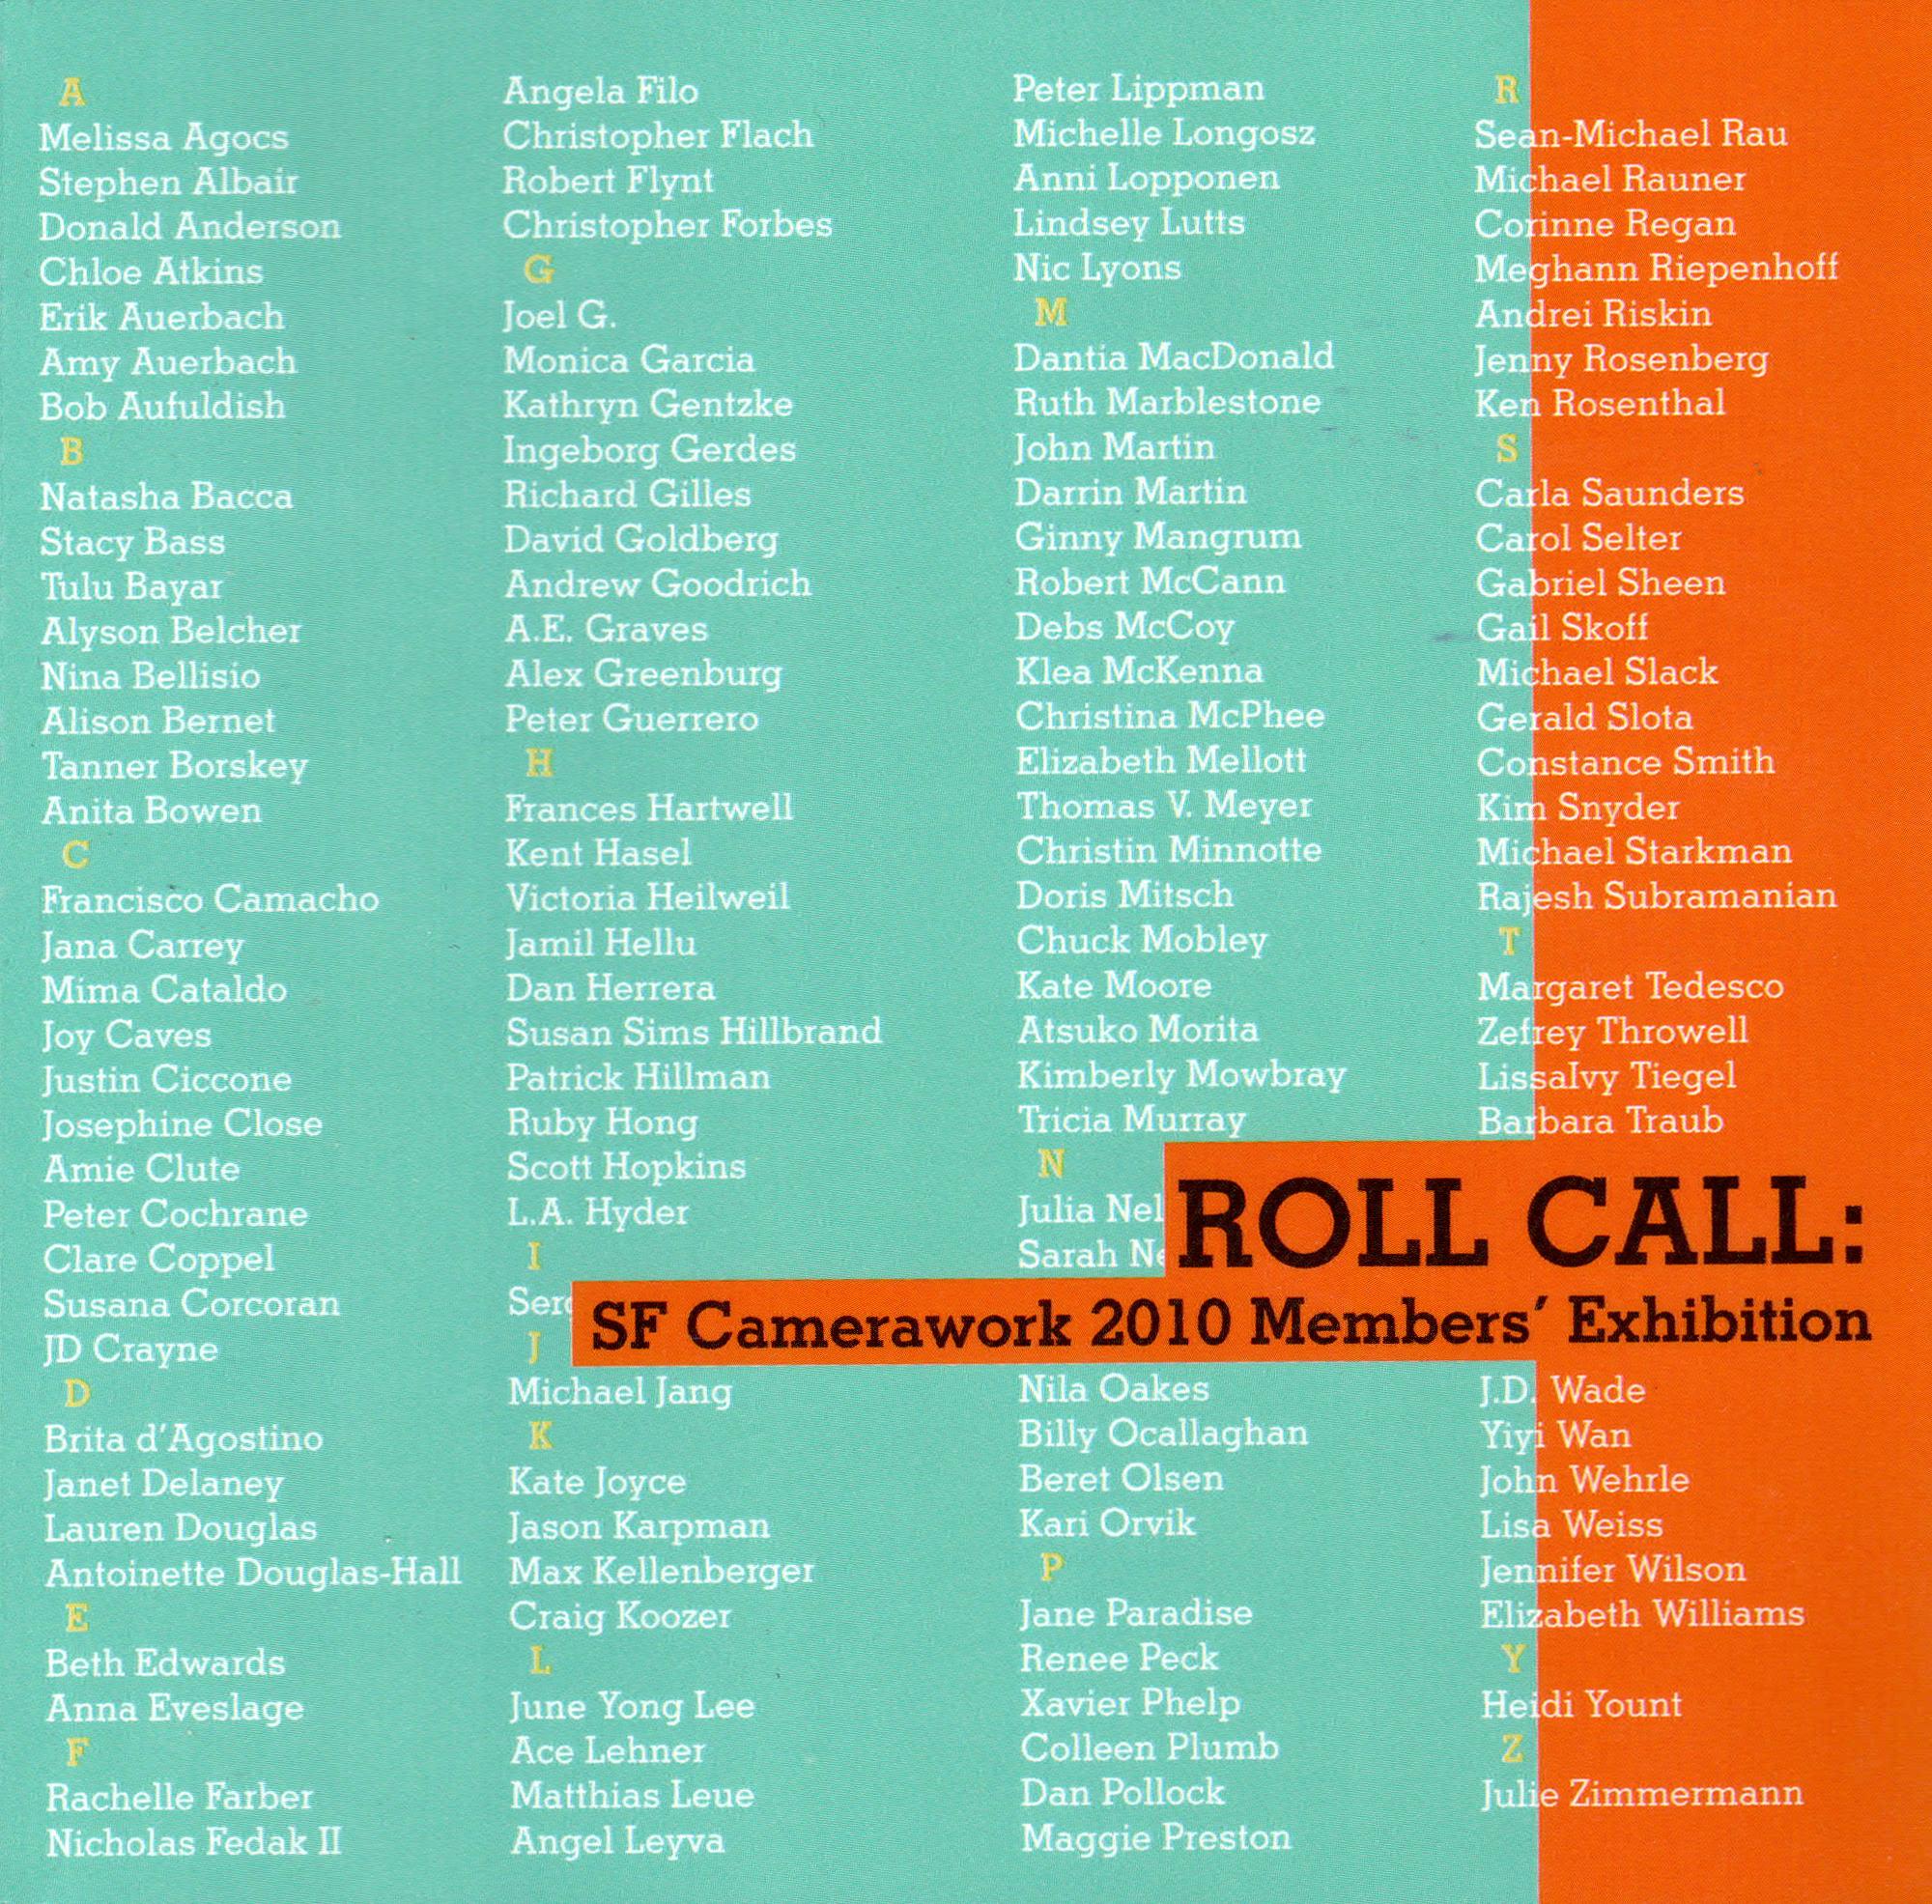 8.Roll.Call.jpg